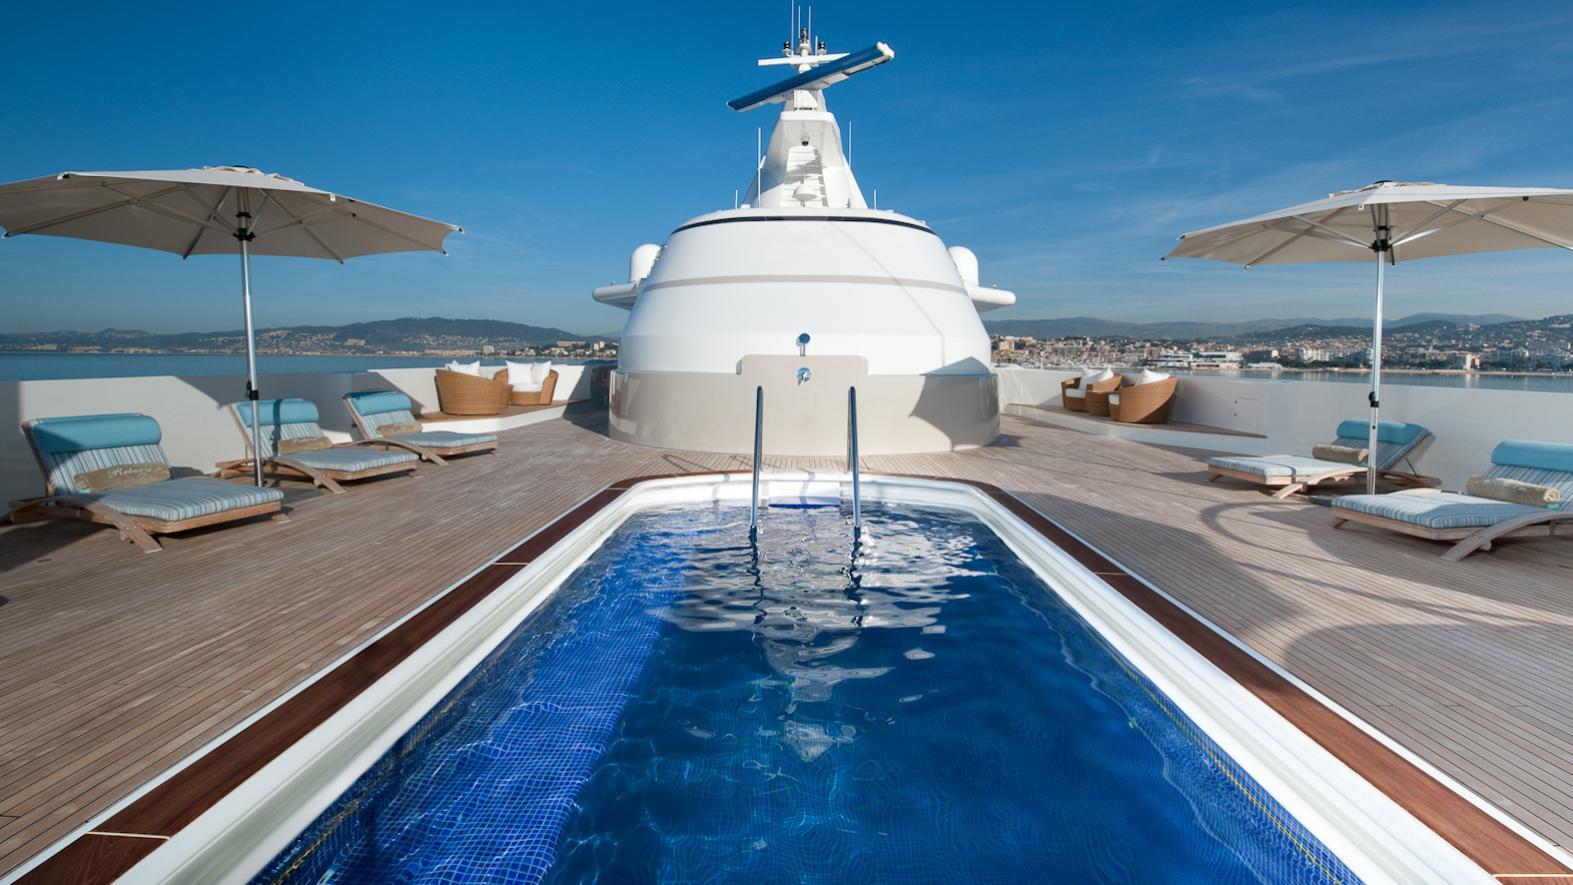 reborn-motor-yacht-amels-1999-75m-pool-sundeck